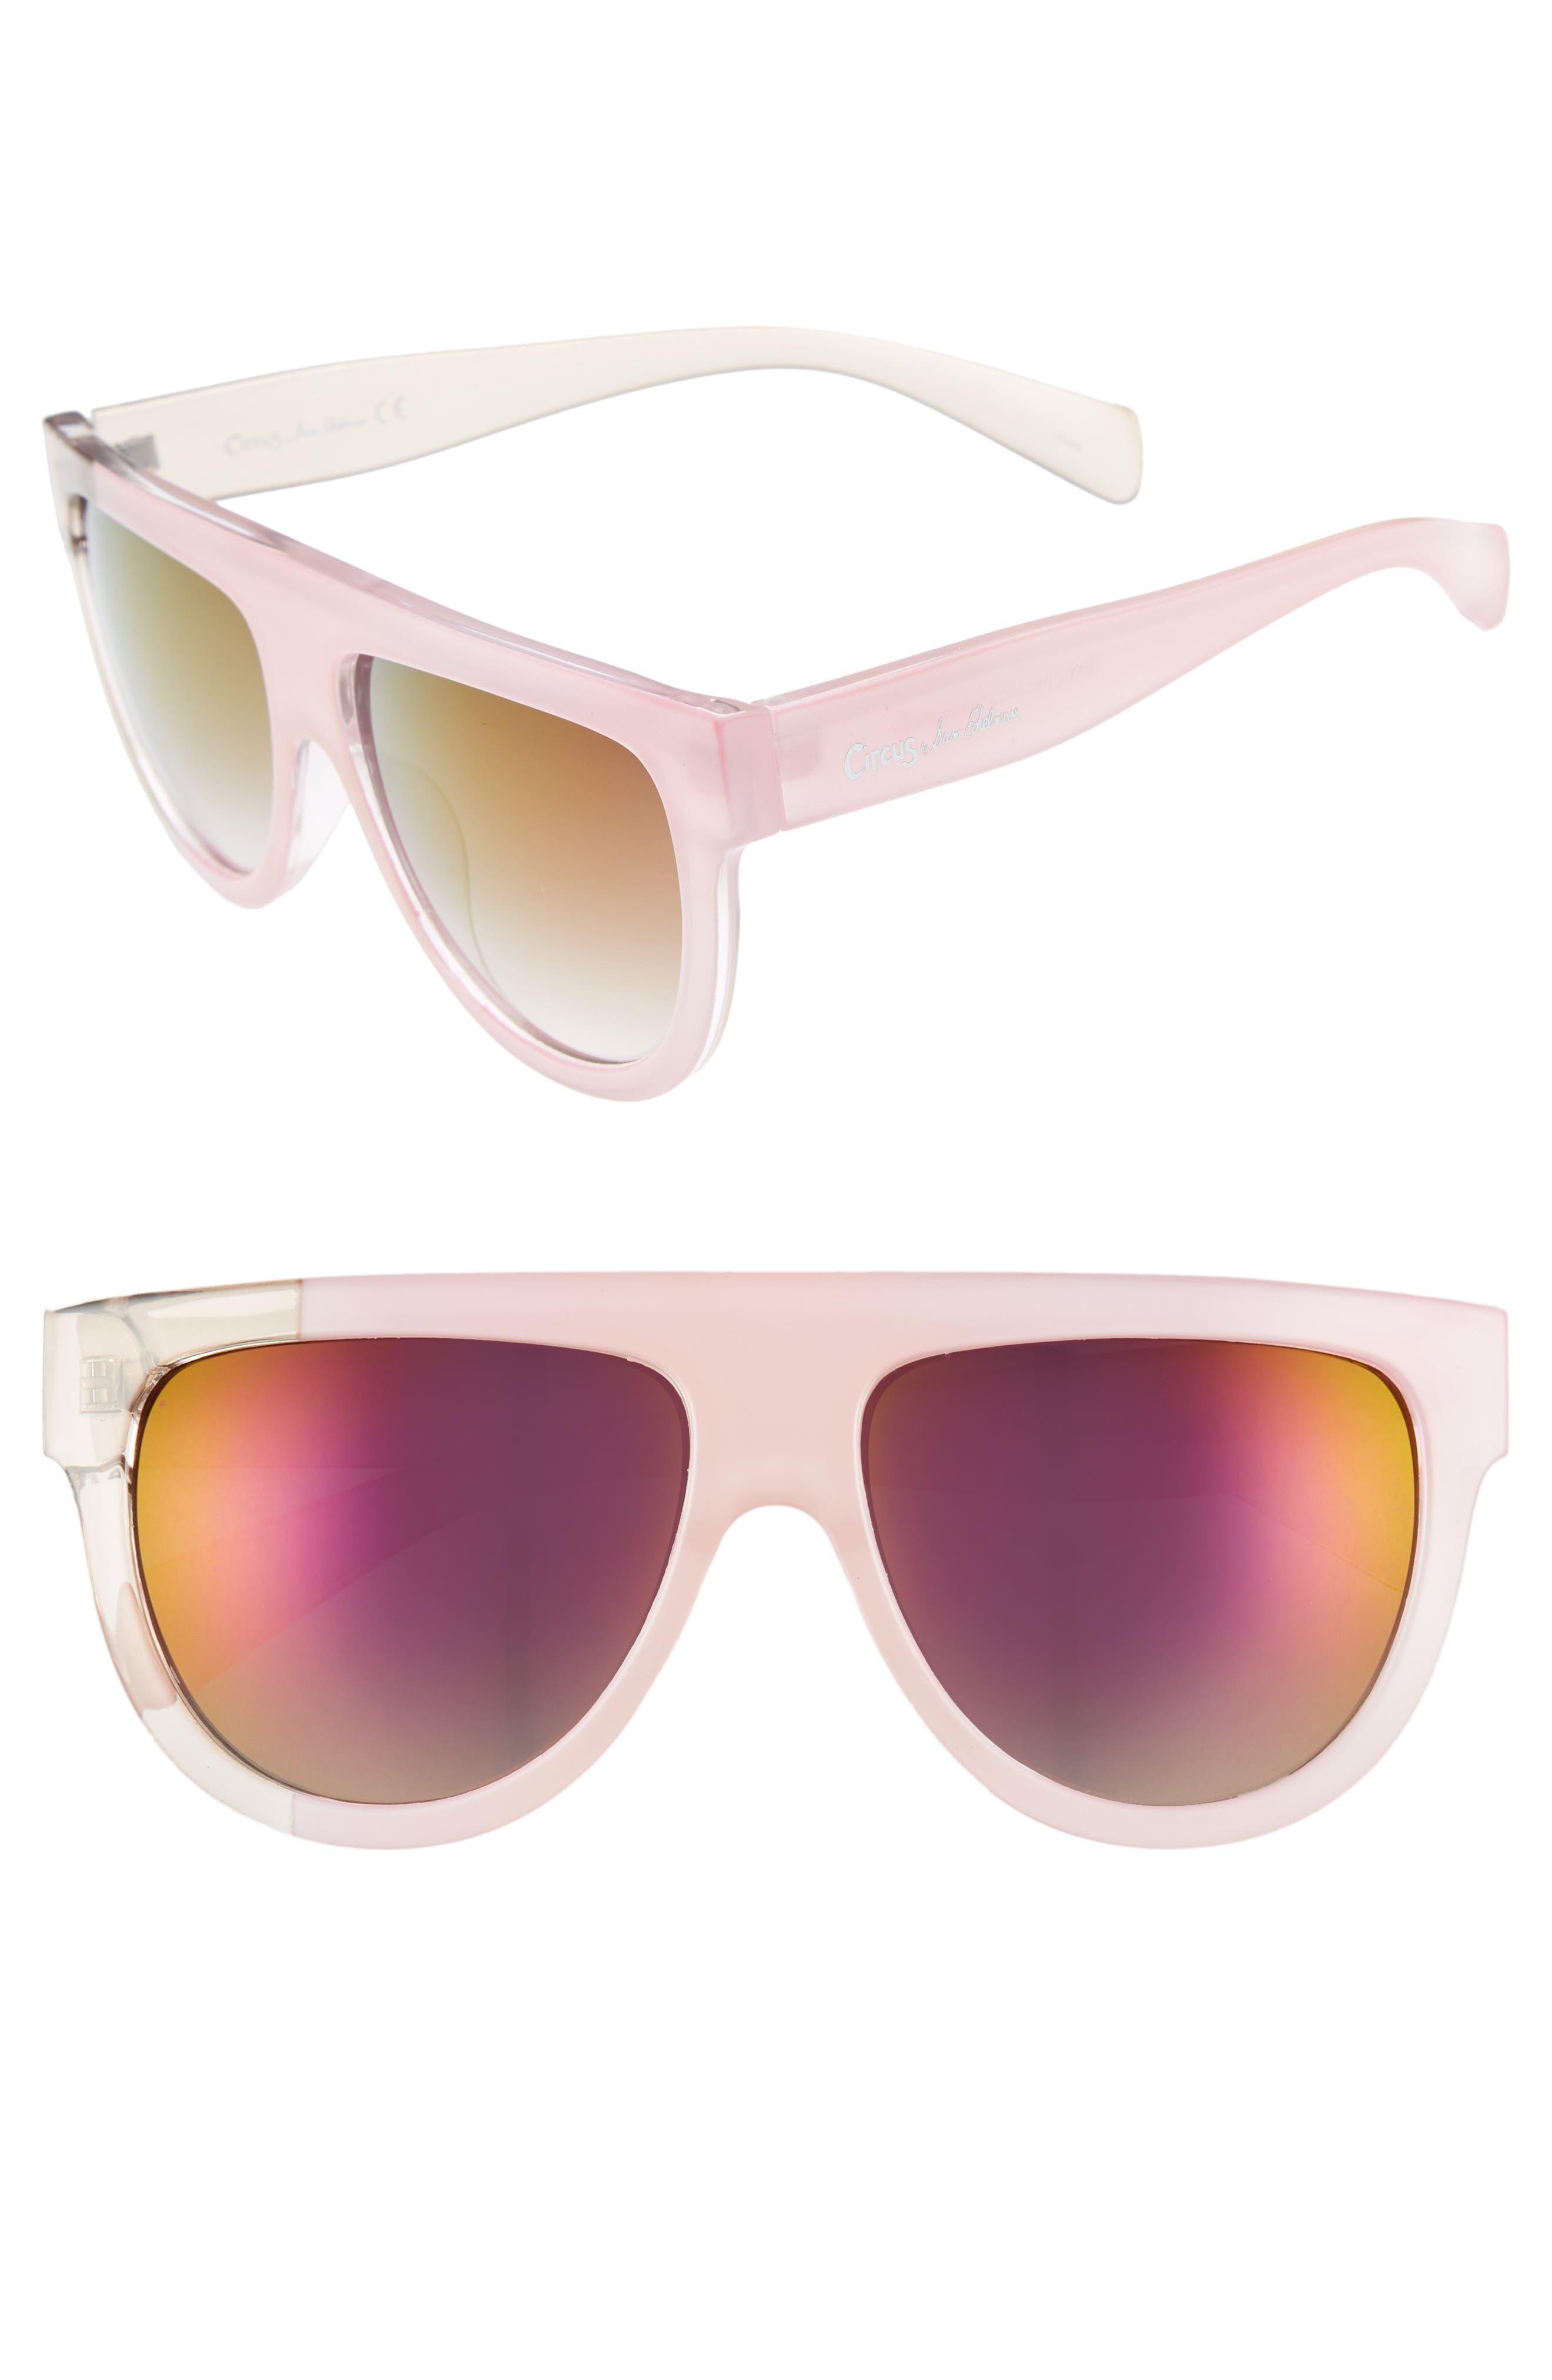 Circus by Sam Edelman 68mm Flat Top Sunglasses